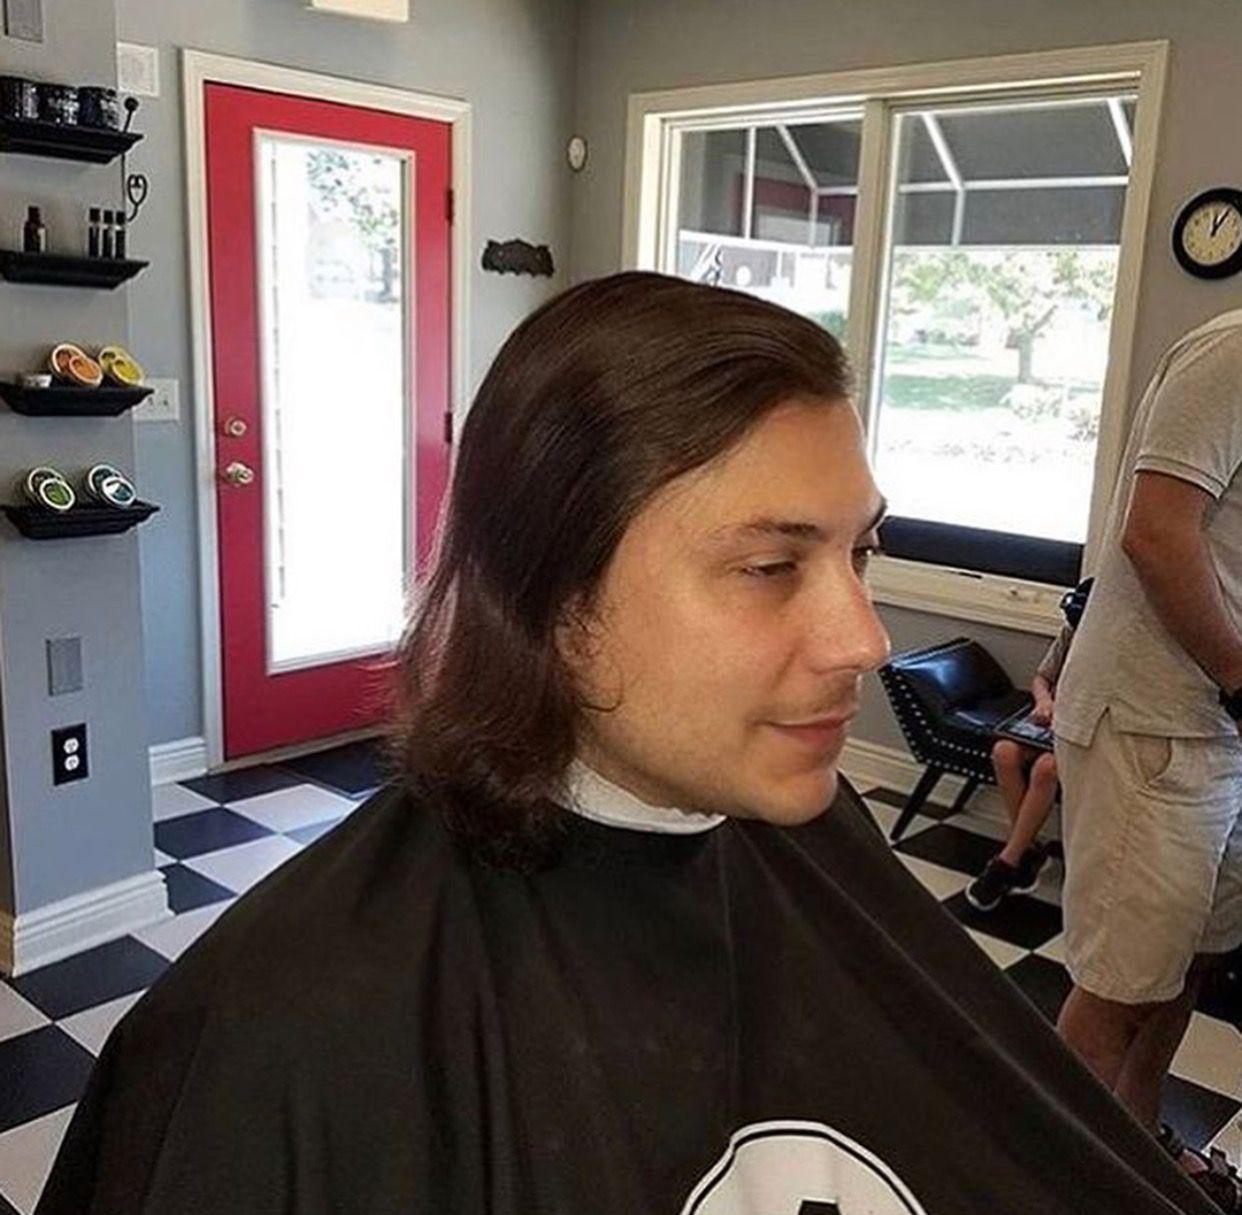 Frank Iero Before The Big Haircut A Frank Iero